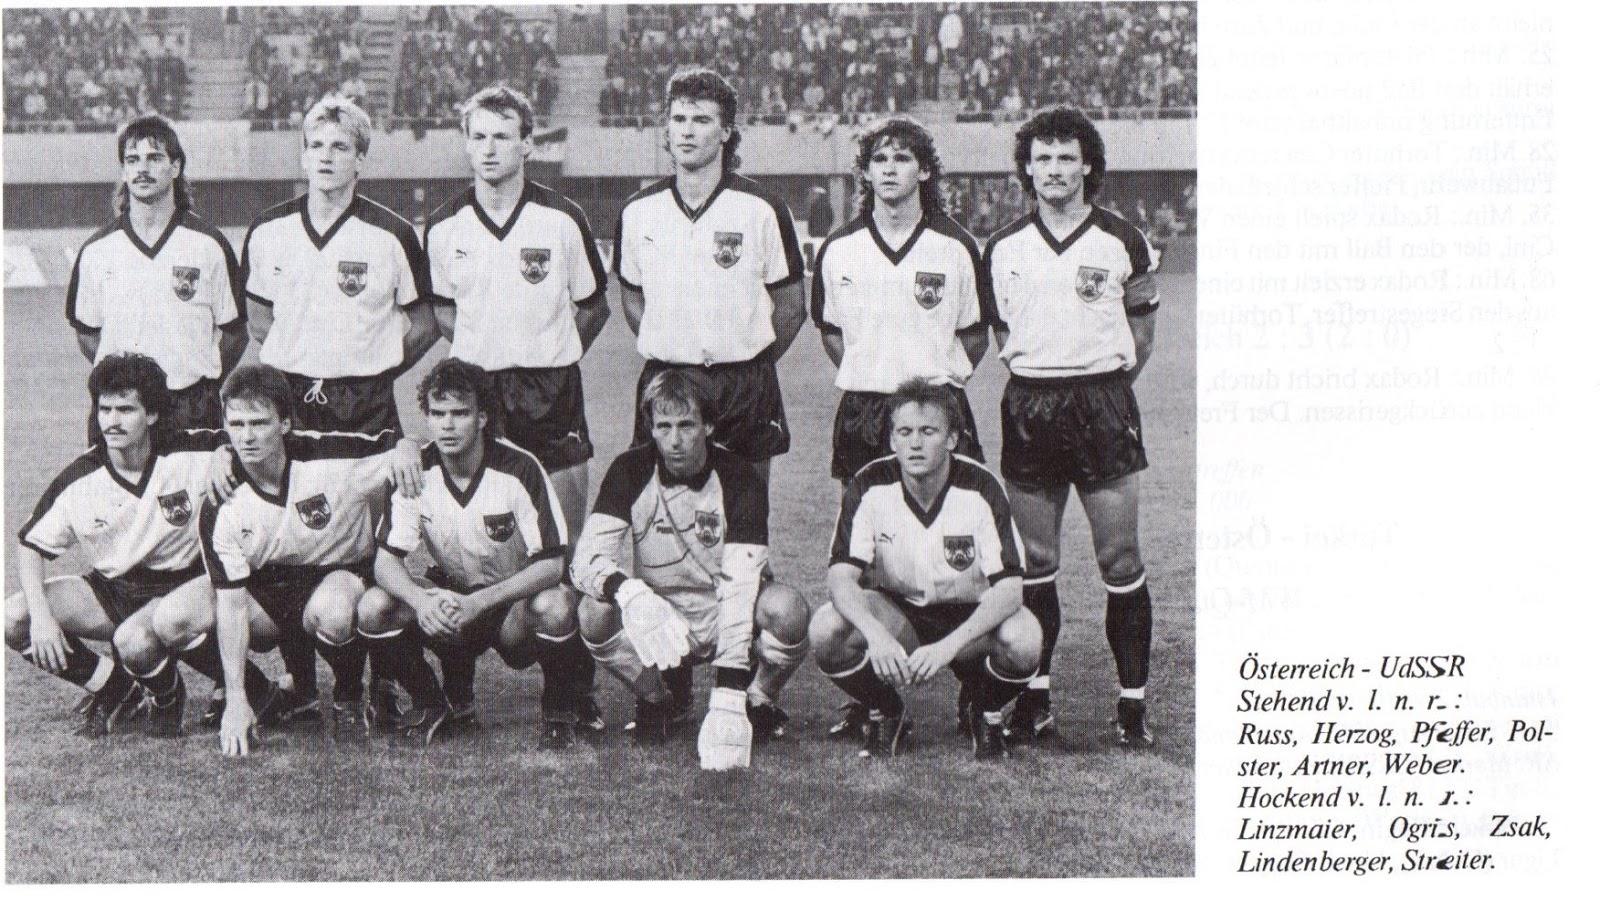 soccer nostalgia international season 1989 90, part 3  fu%c3%83%c2%9fball torwart c 8 #7